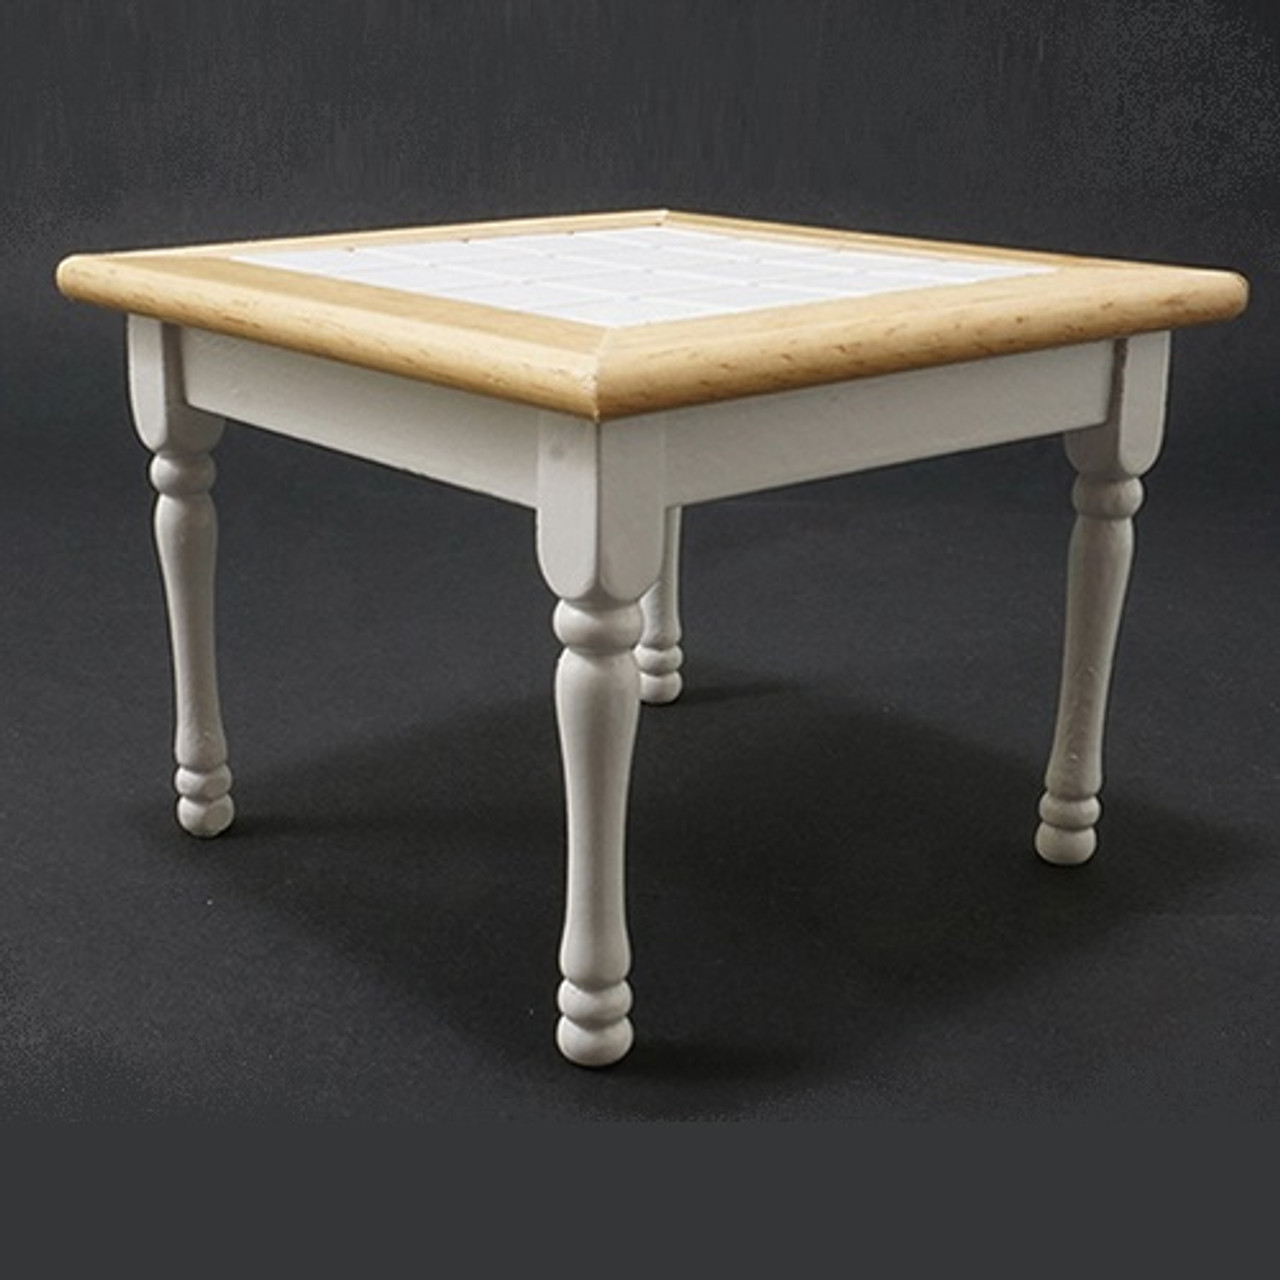 Table, Oak and White (CLA10218); side angled